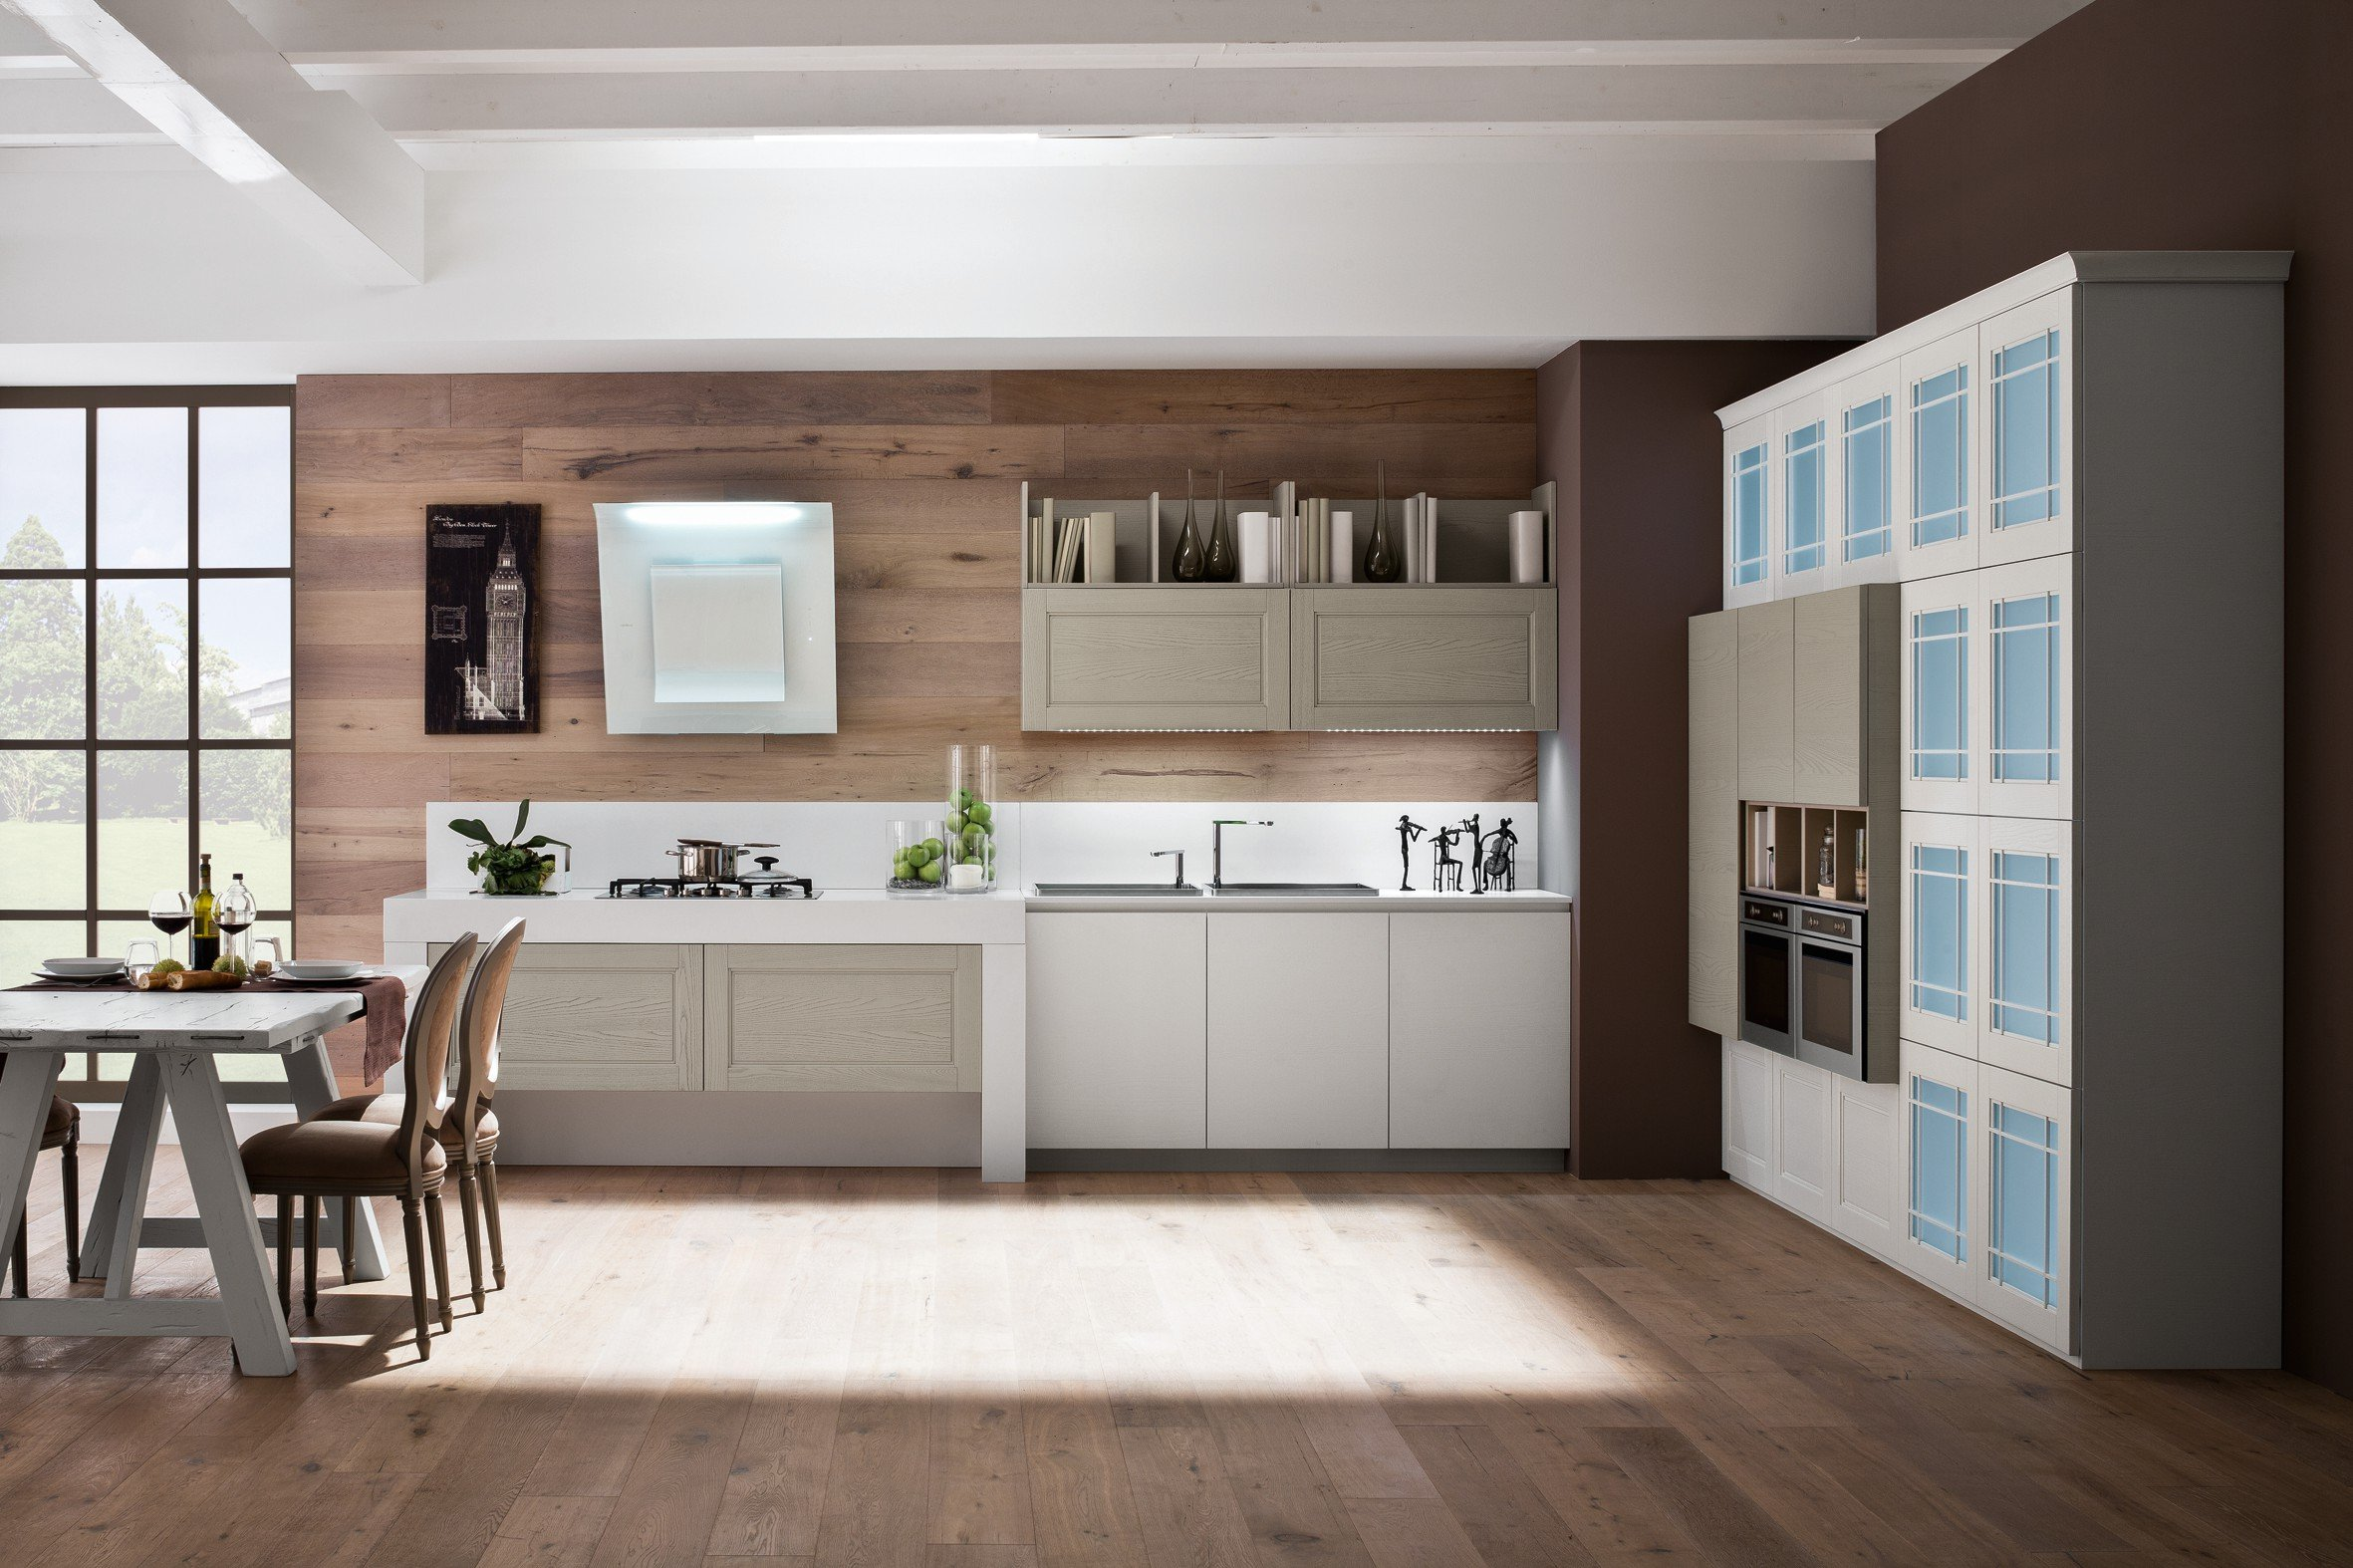 Beautiful come comporre una cucina photos - Comporre cucina ...